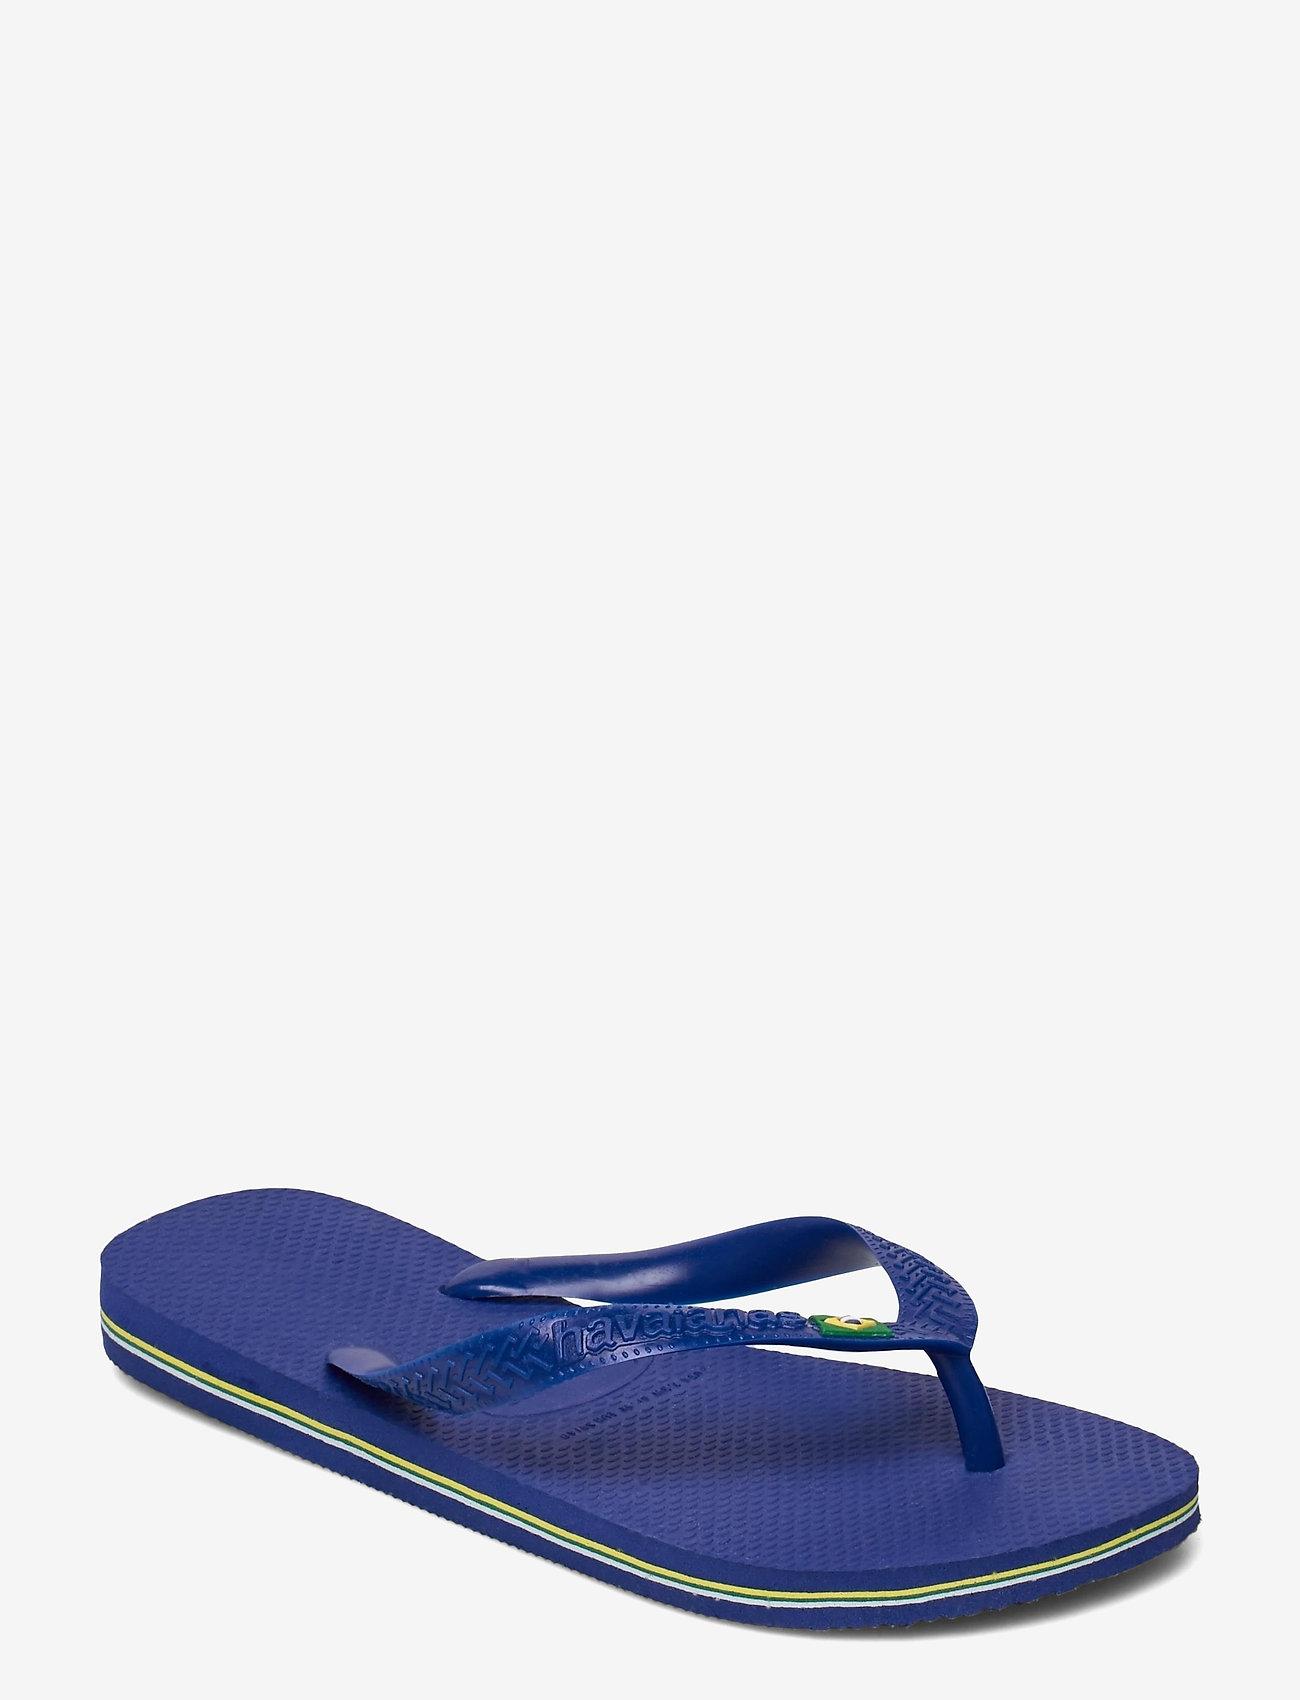 Havaianas - Brasil - teenslippers - marine blue 2711 - 0